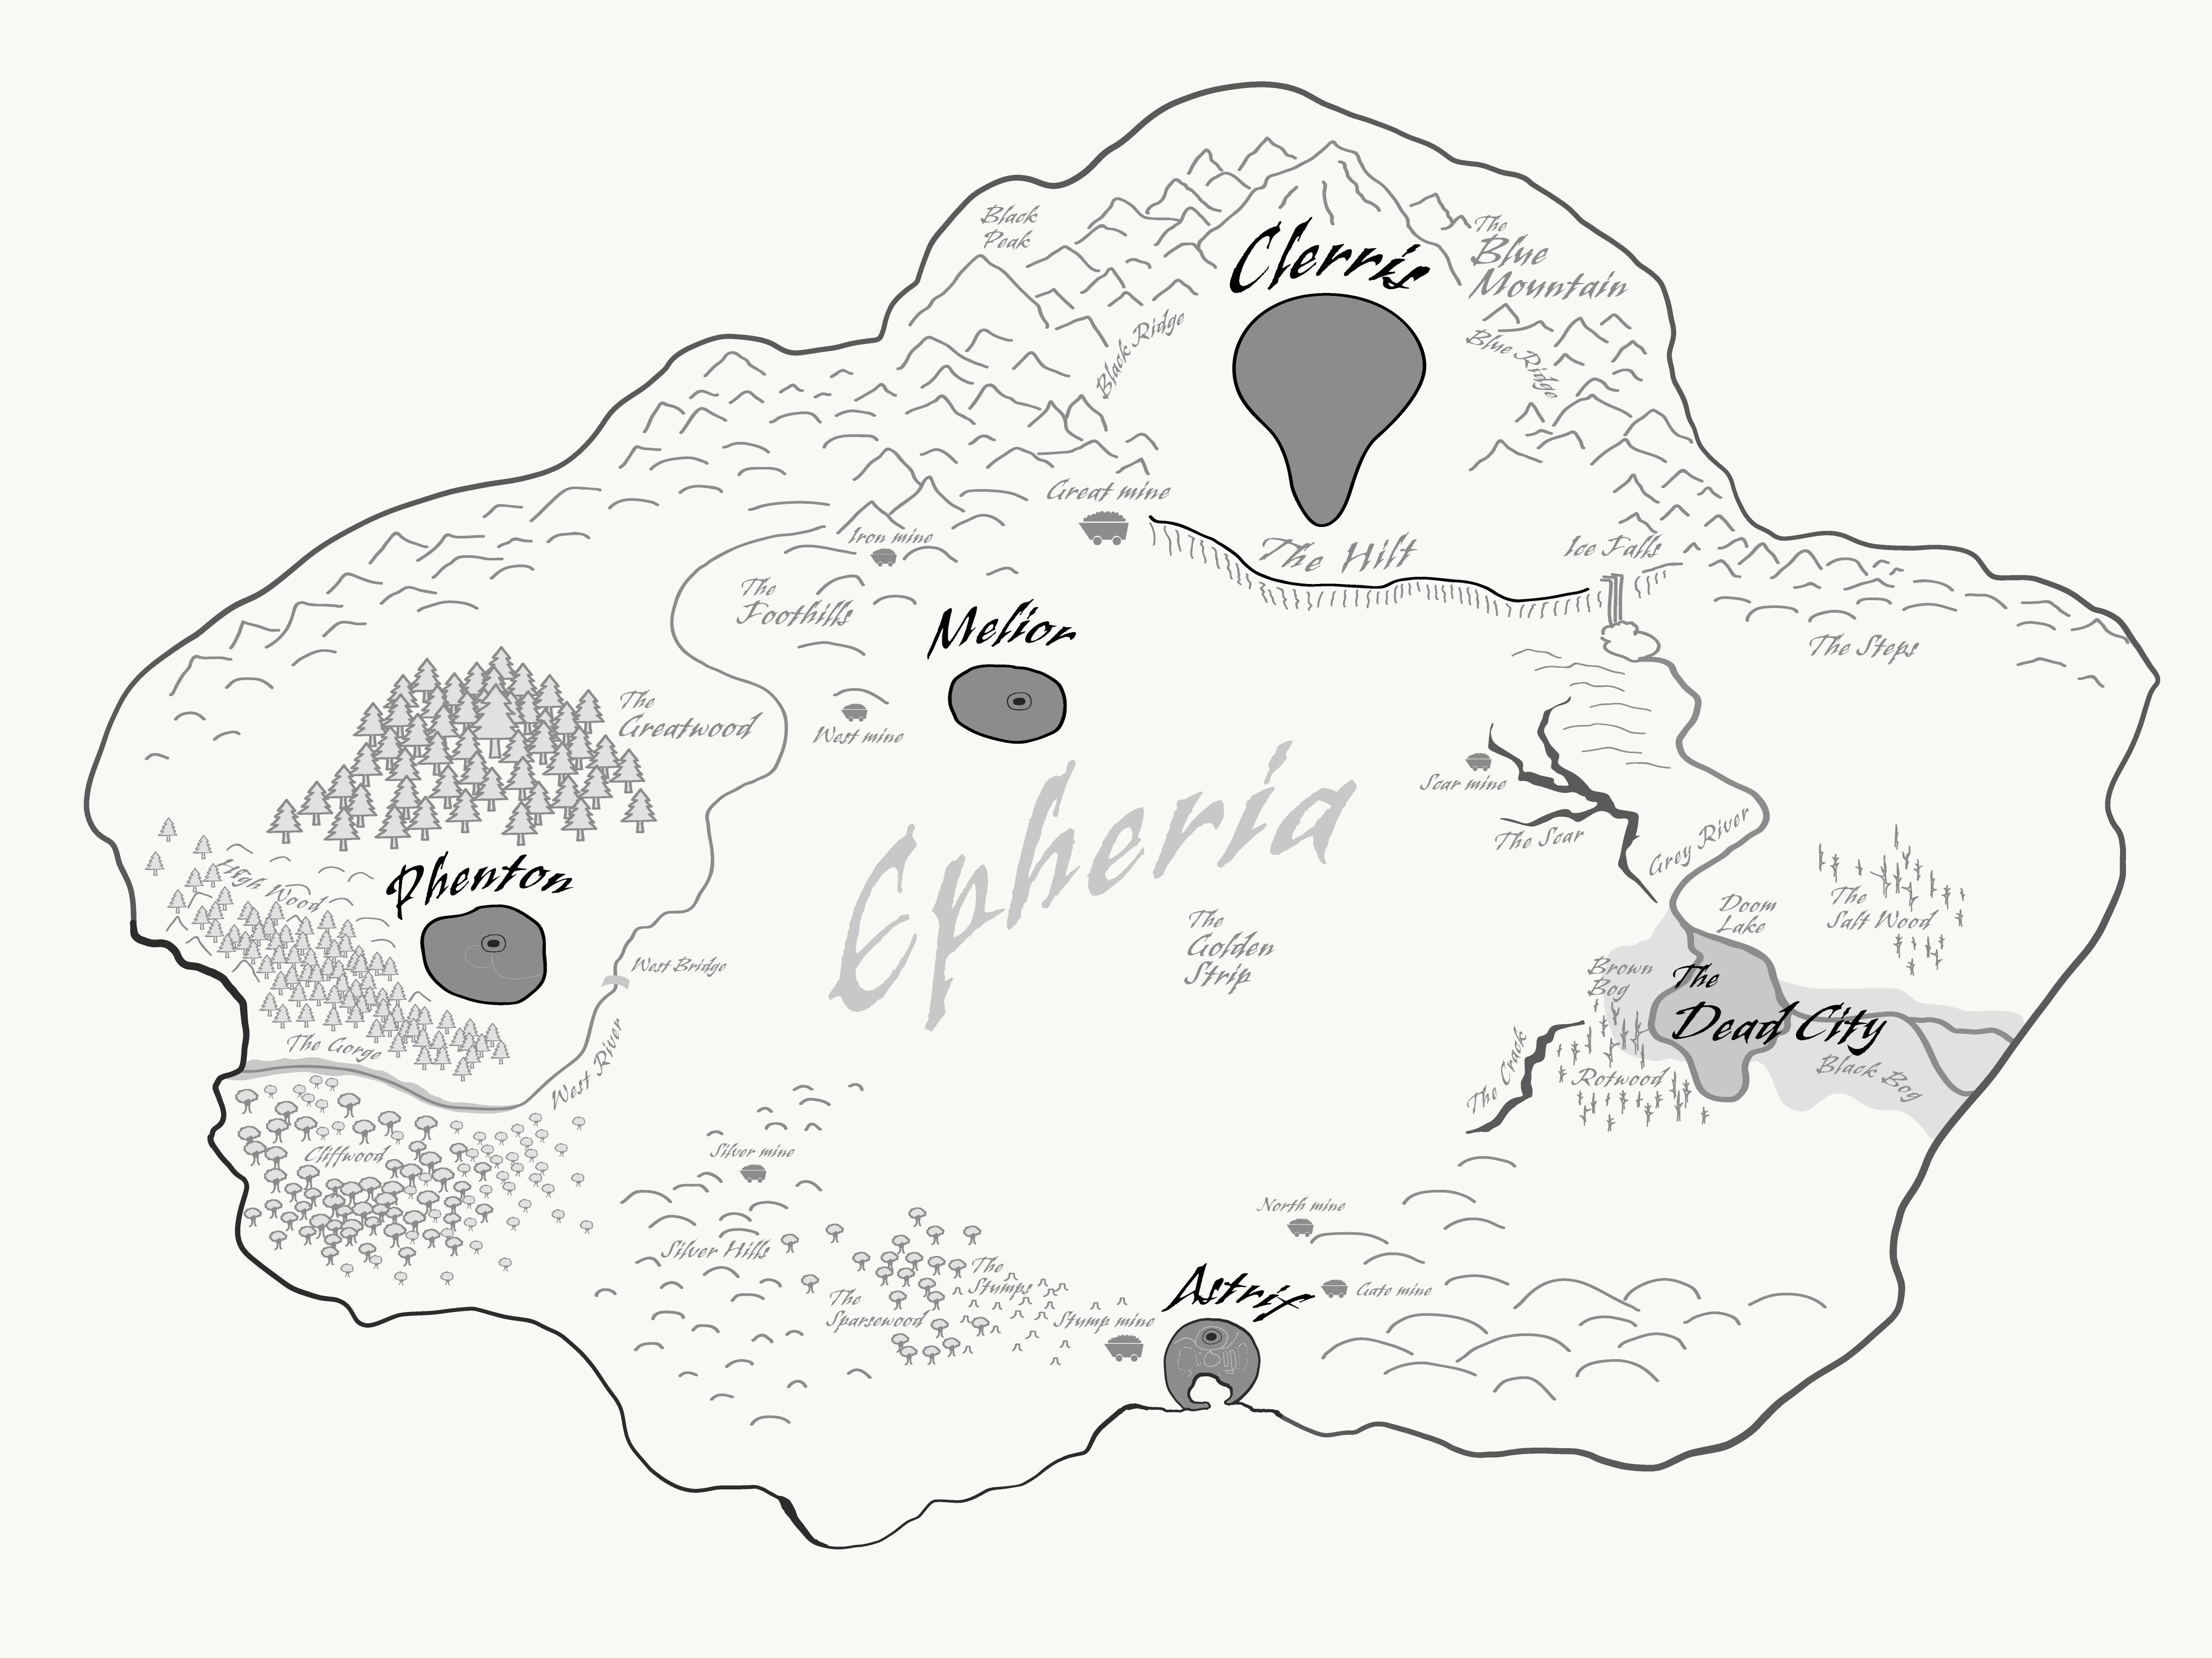 Epheria-Map-v1.png